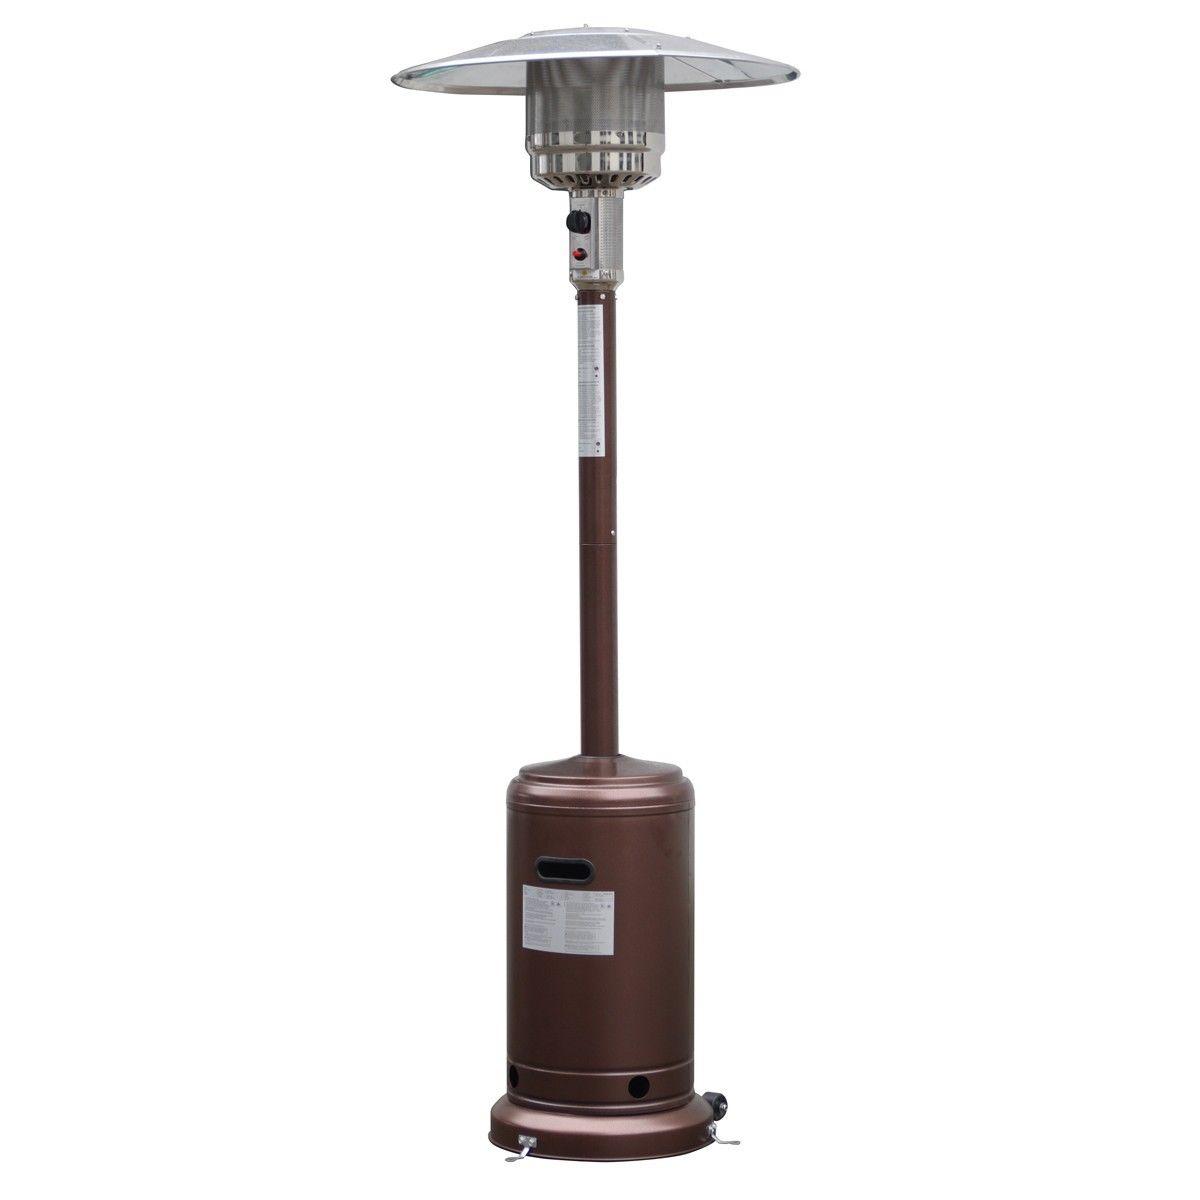 Patio Propane Standing LP Gas Steel Accessories Heater